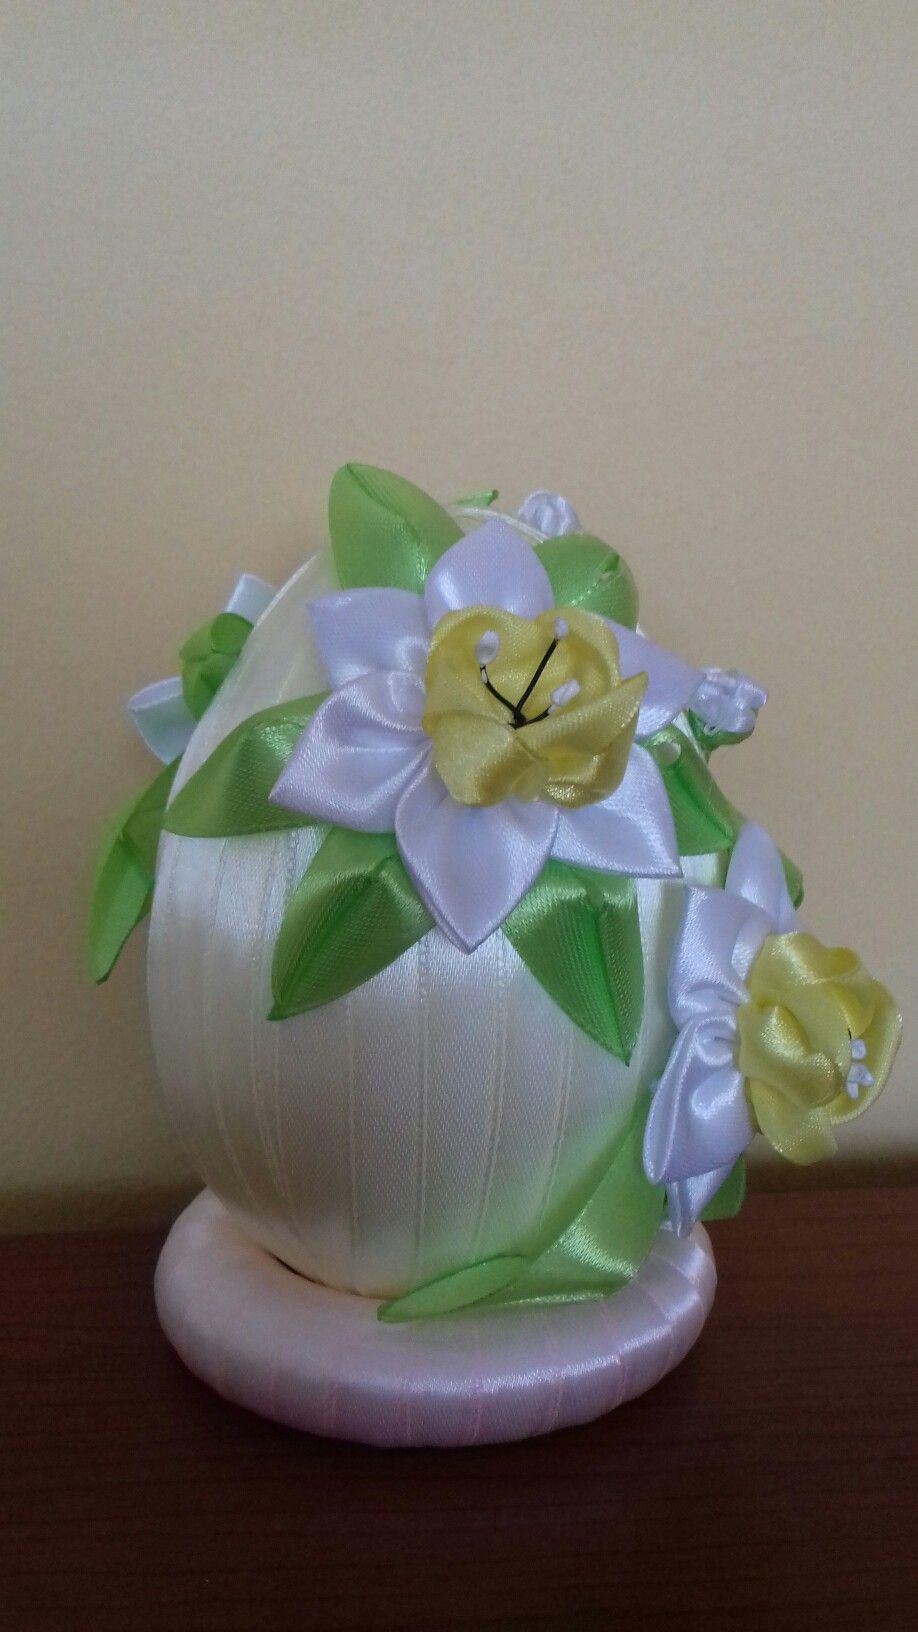 Jajko Wielkanocne Styropian Decor Kanzashi Flowers